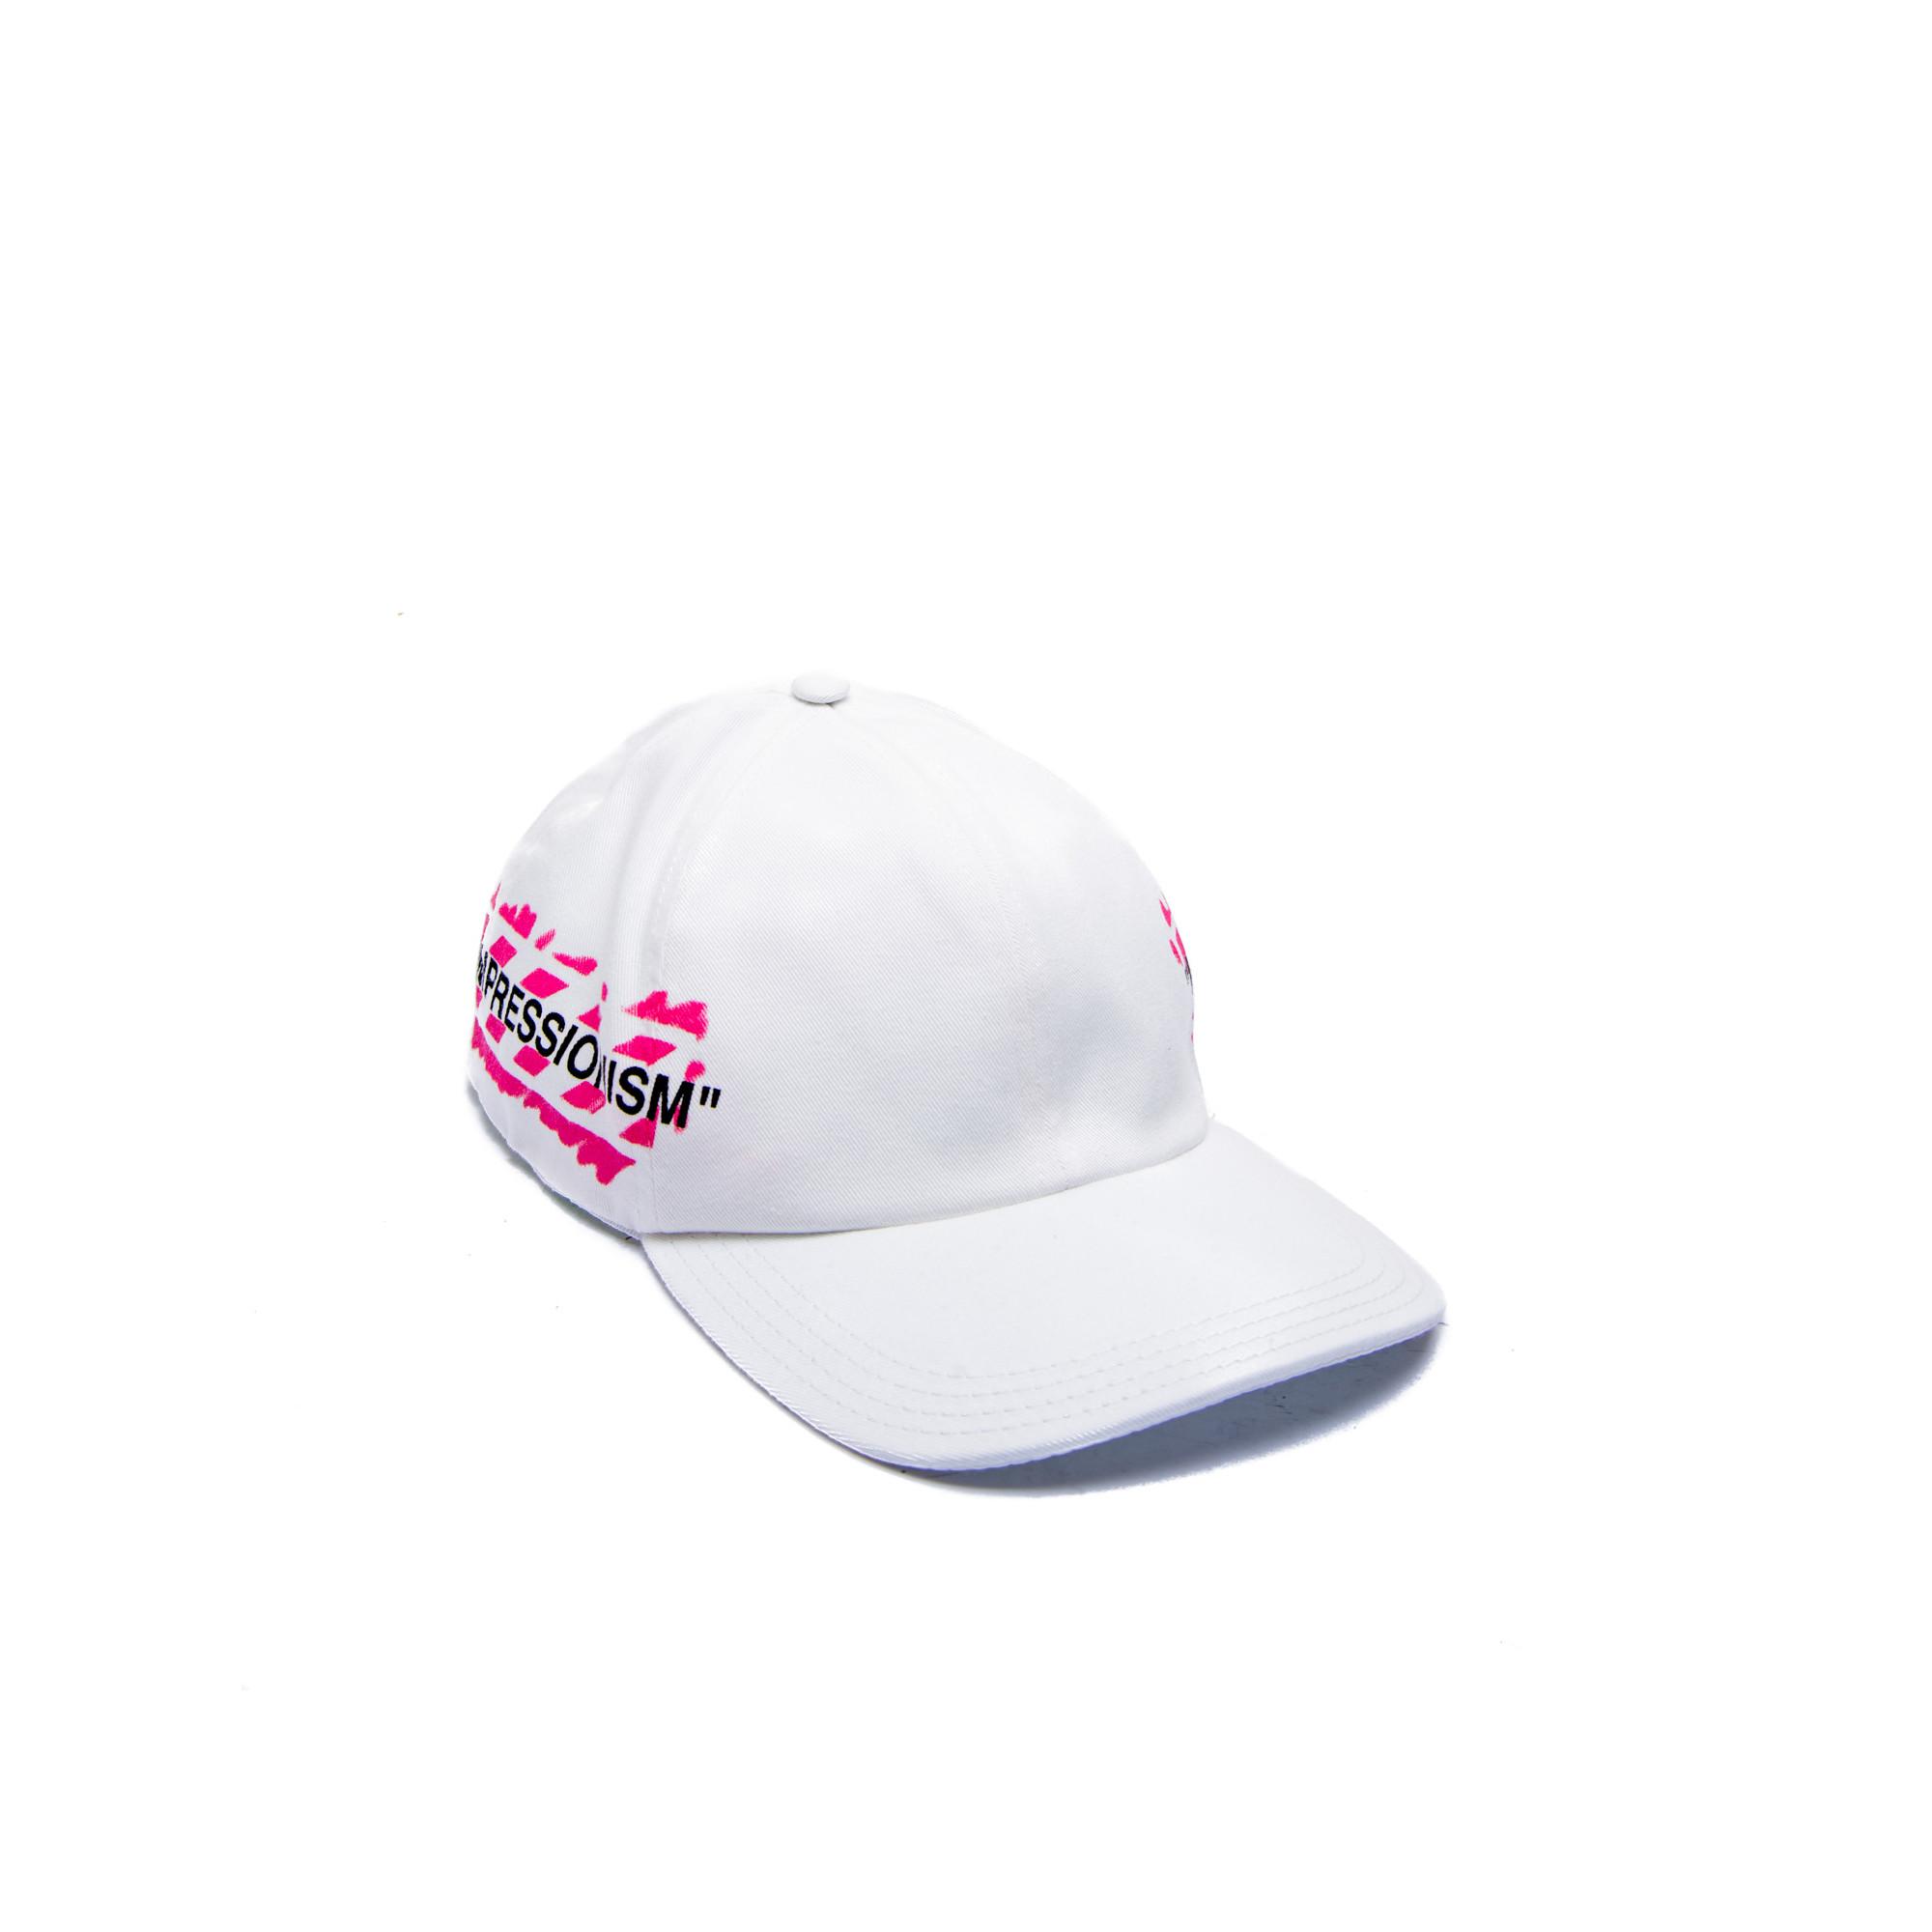 46c93c910a41b0 ... Off White stencil baseball cap white Off White stencil baseball cap  white - www.derodeloper ...